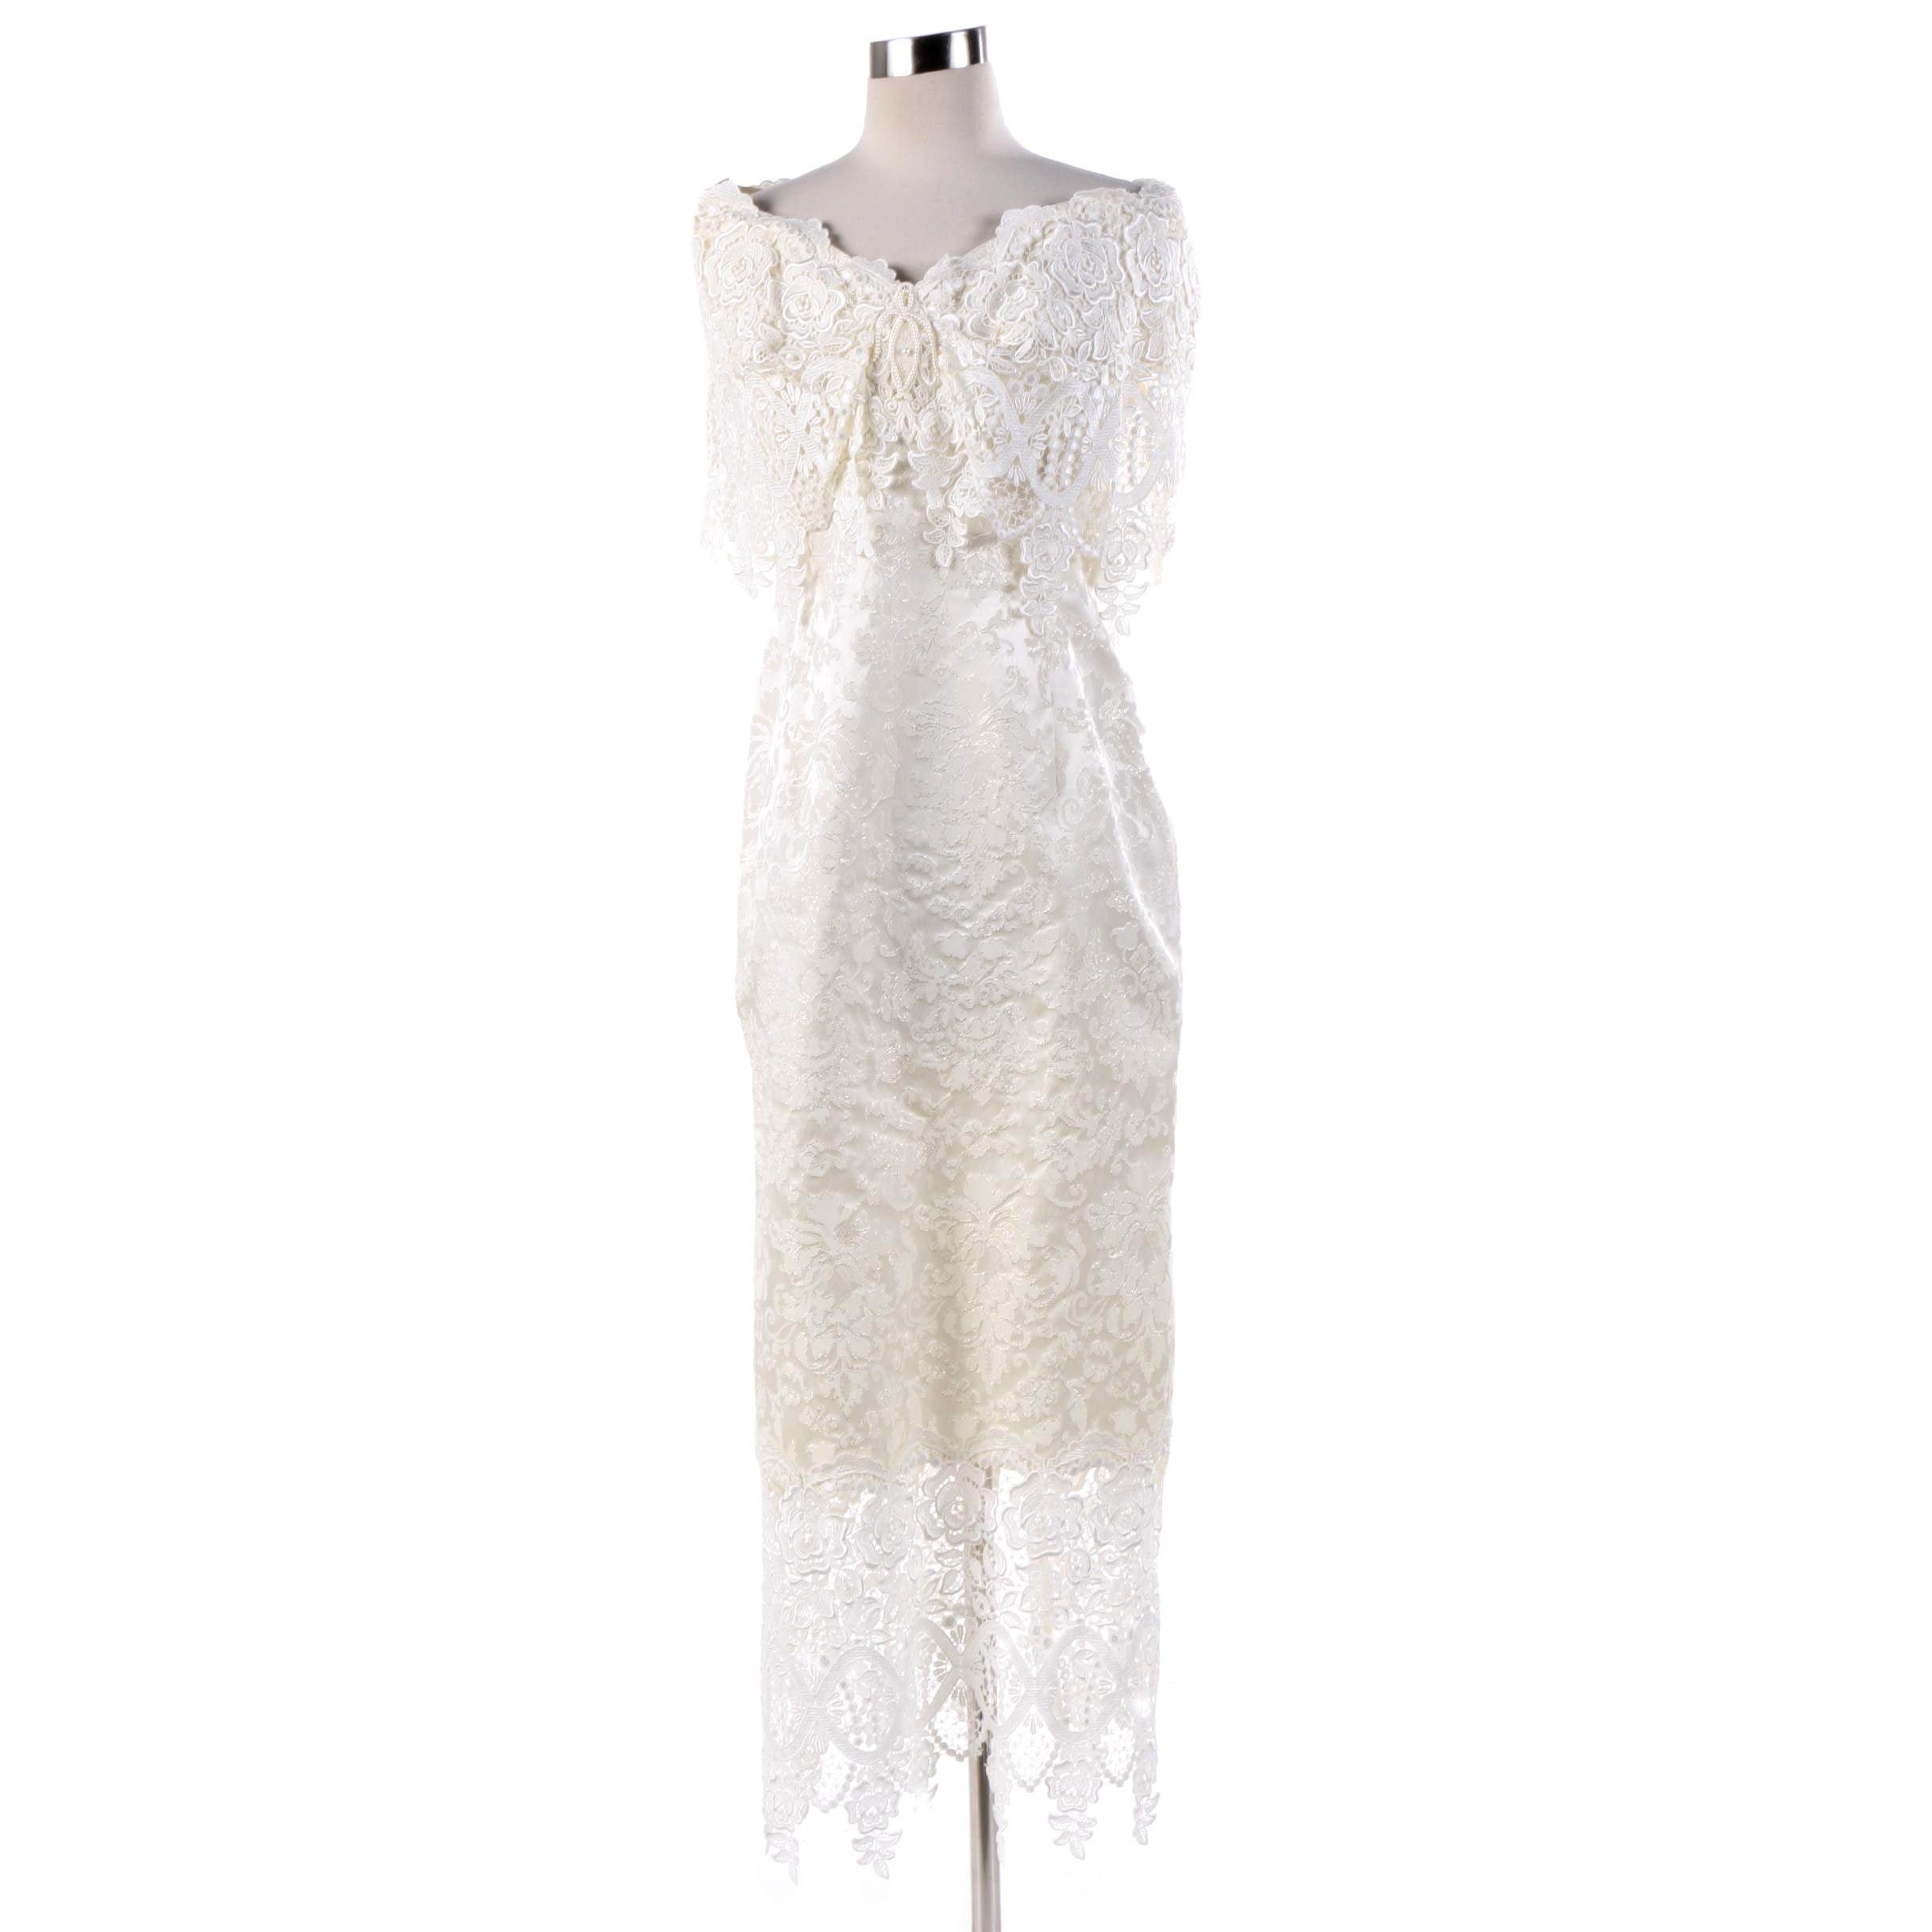 Vintage Jessica McClintock Off-The-Shoulder Brocade and Lace Evening Dress